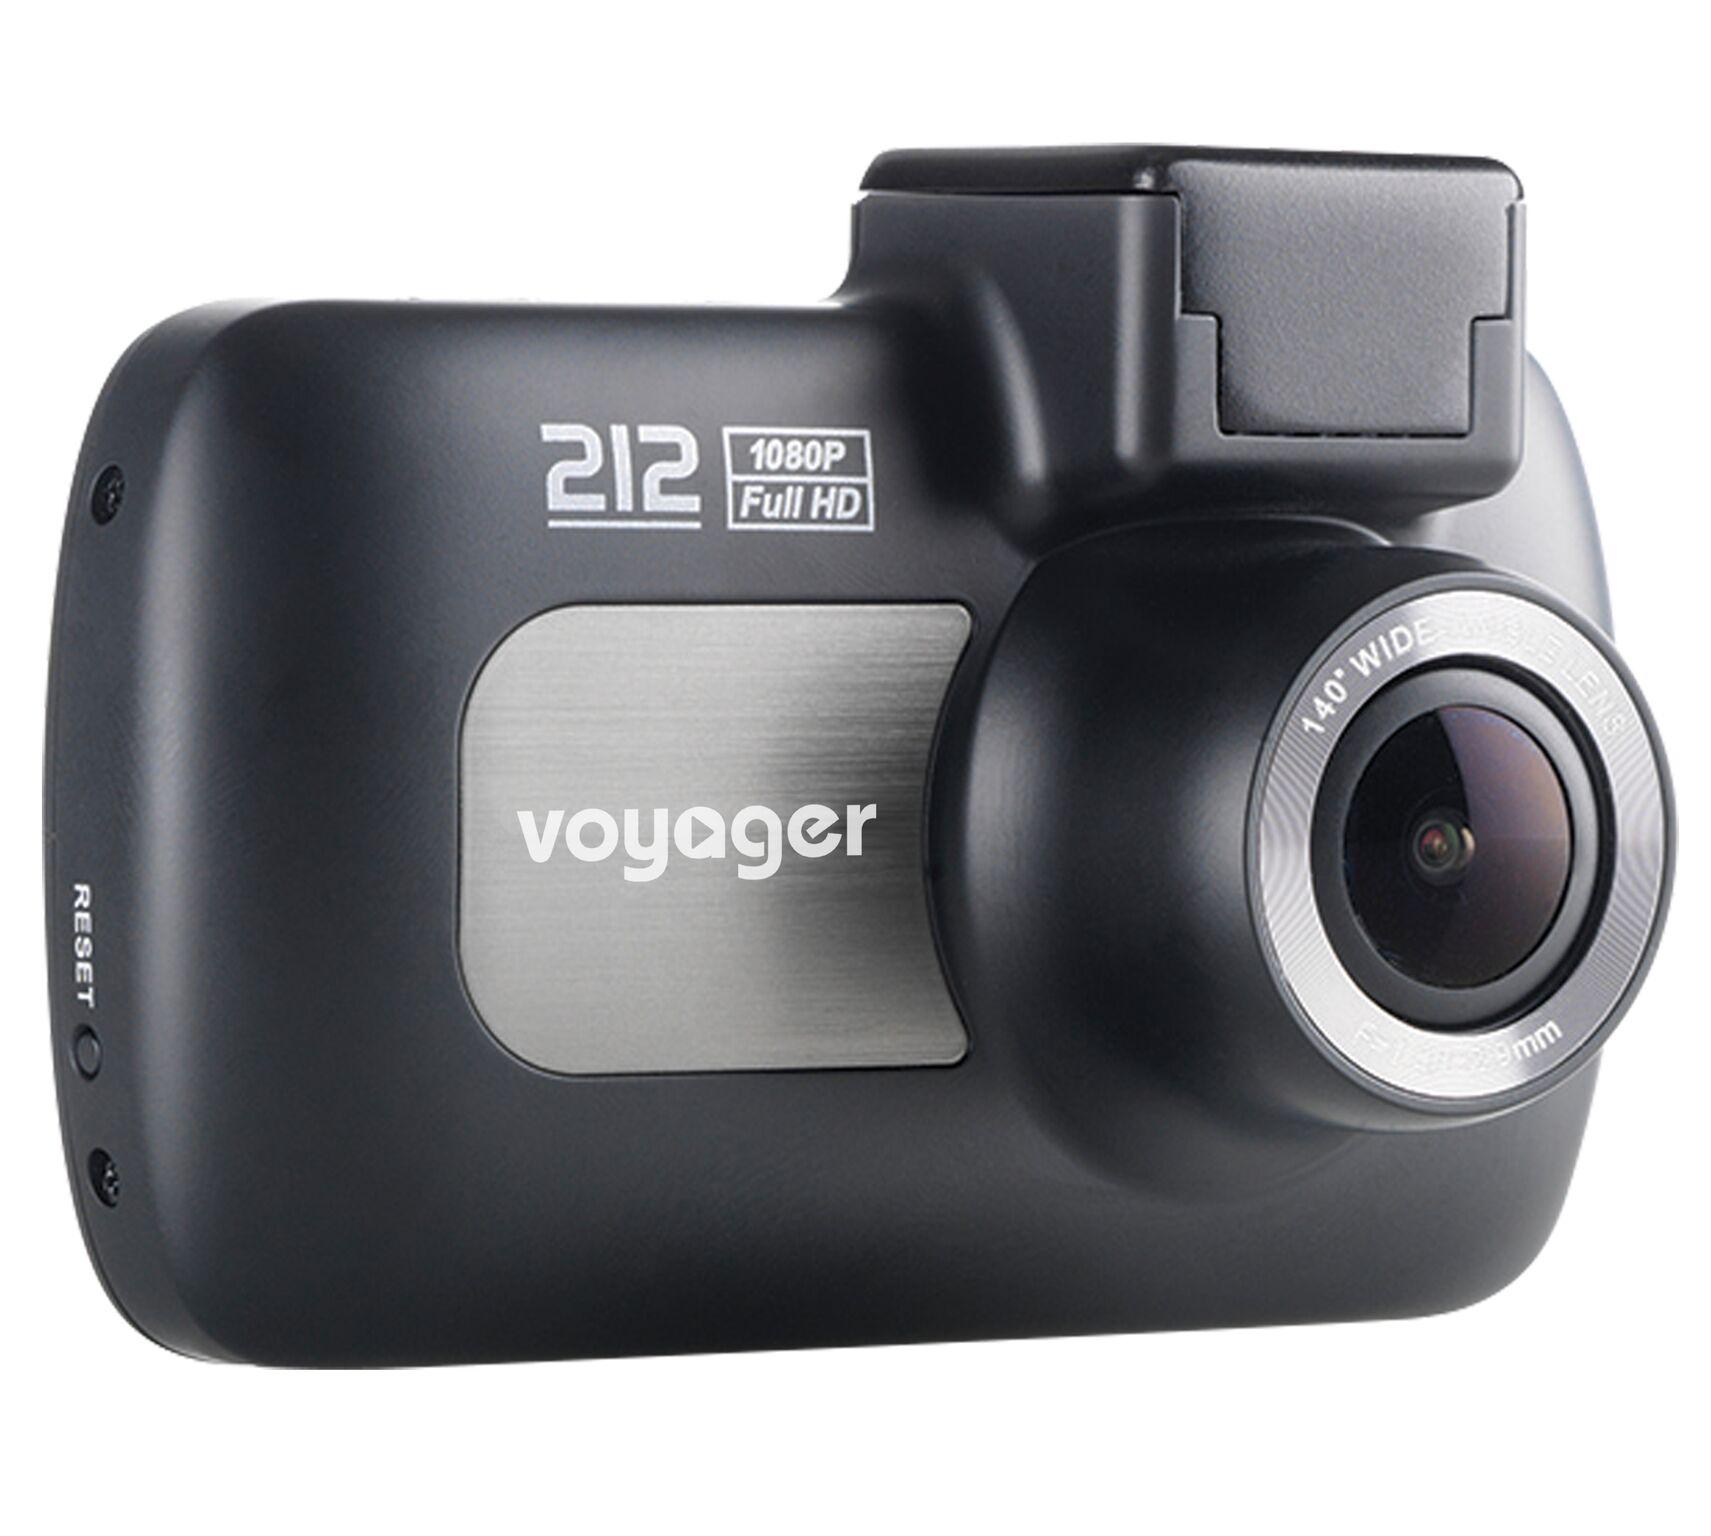 Voyager 212 £14.99, Canon IXUS 185 £29.99, Polaroid SNAP £24.99 & Motorola MBP85 connect Baby Monitor/Cam £19.99 @Aldi